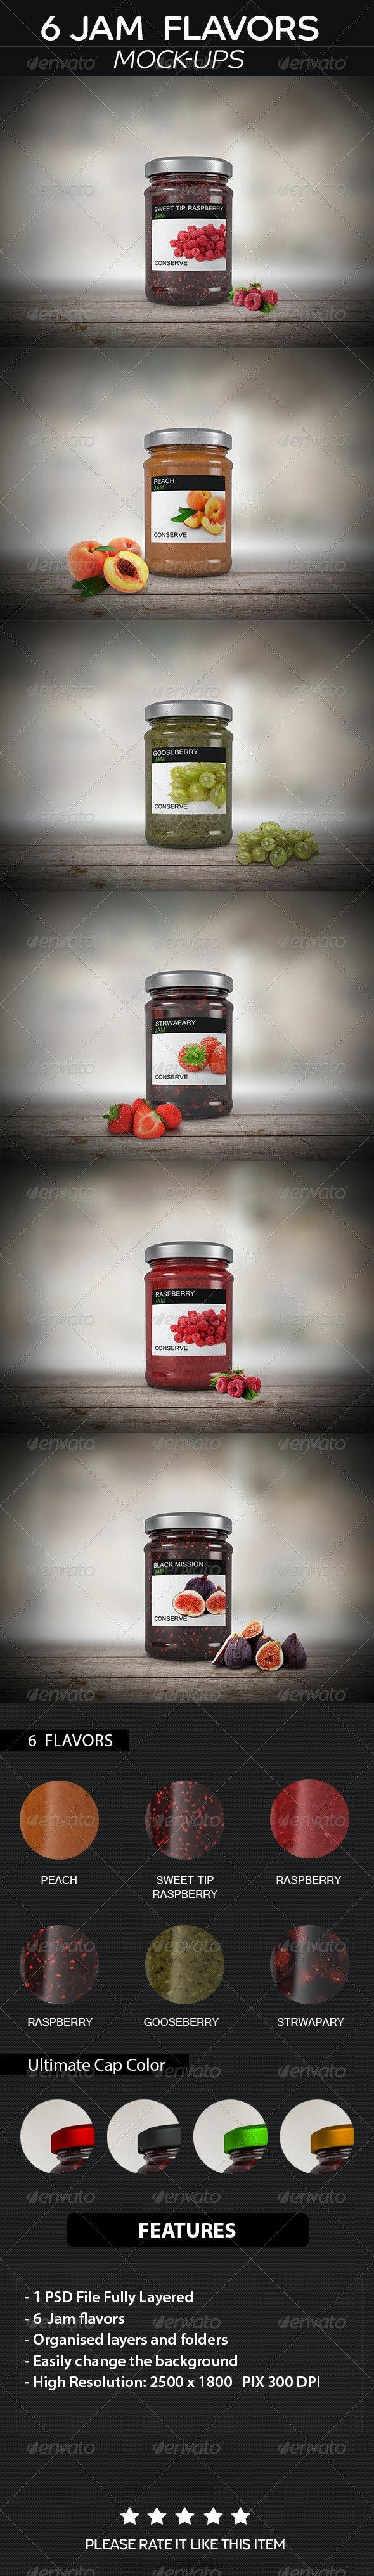 6 Jam Jar Flavors Mock up - Food and Drink Packaging